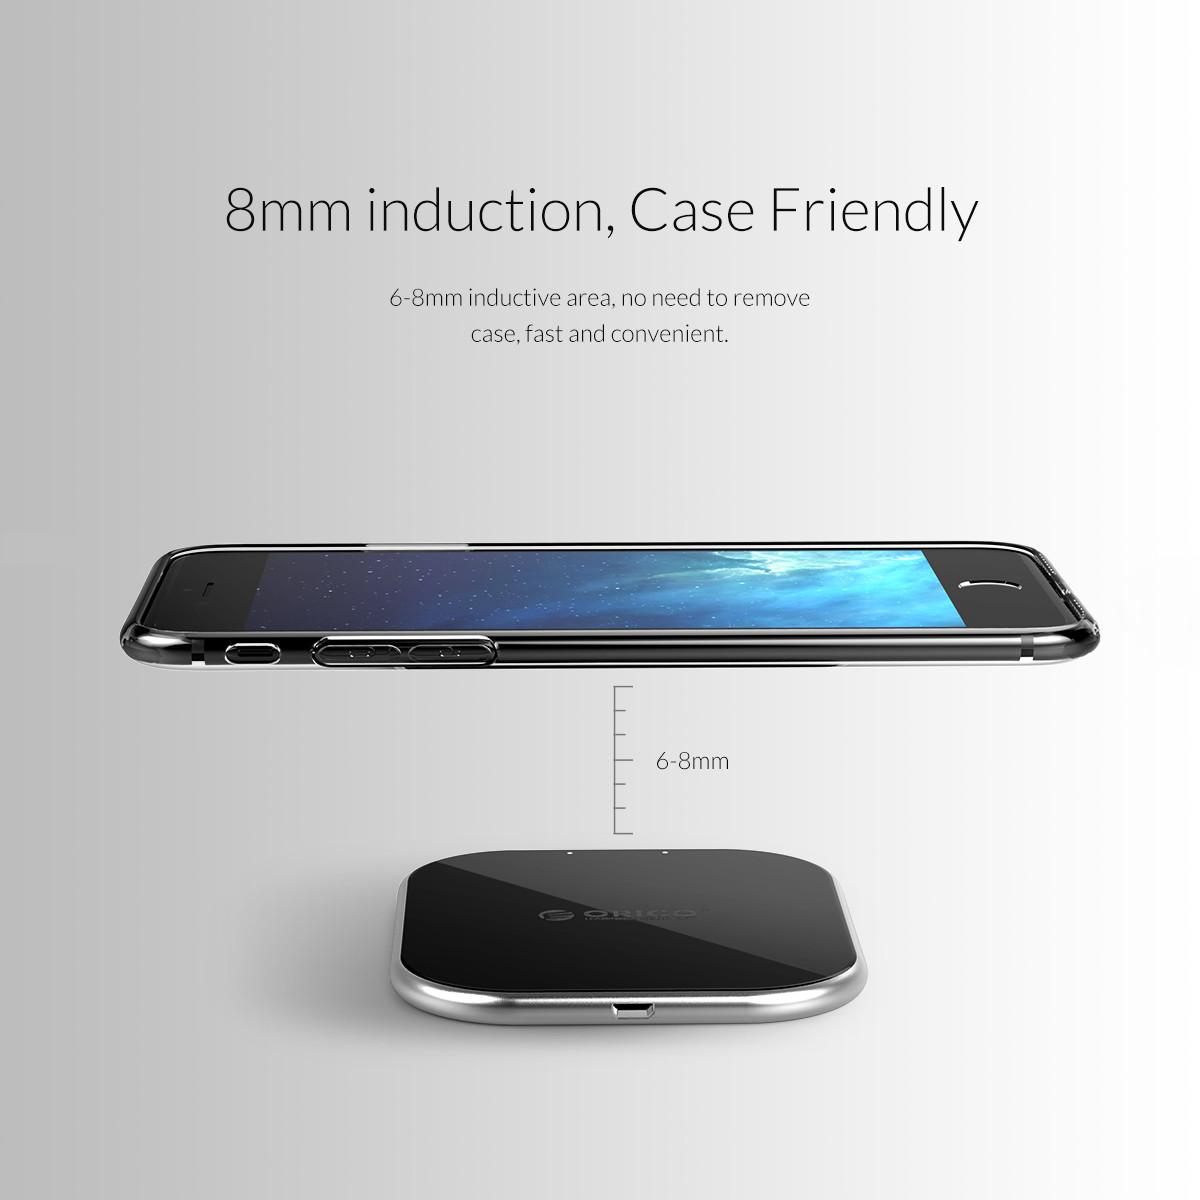 cc2932171c6 ORICO WOC6 10W USB Wireless Fast Charger for Samsung Galaxy iPhone X/8/8Plus